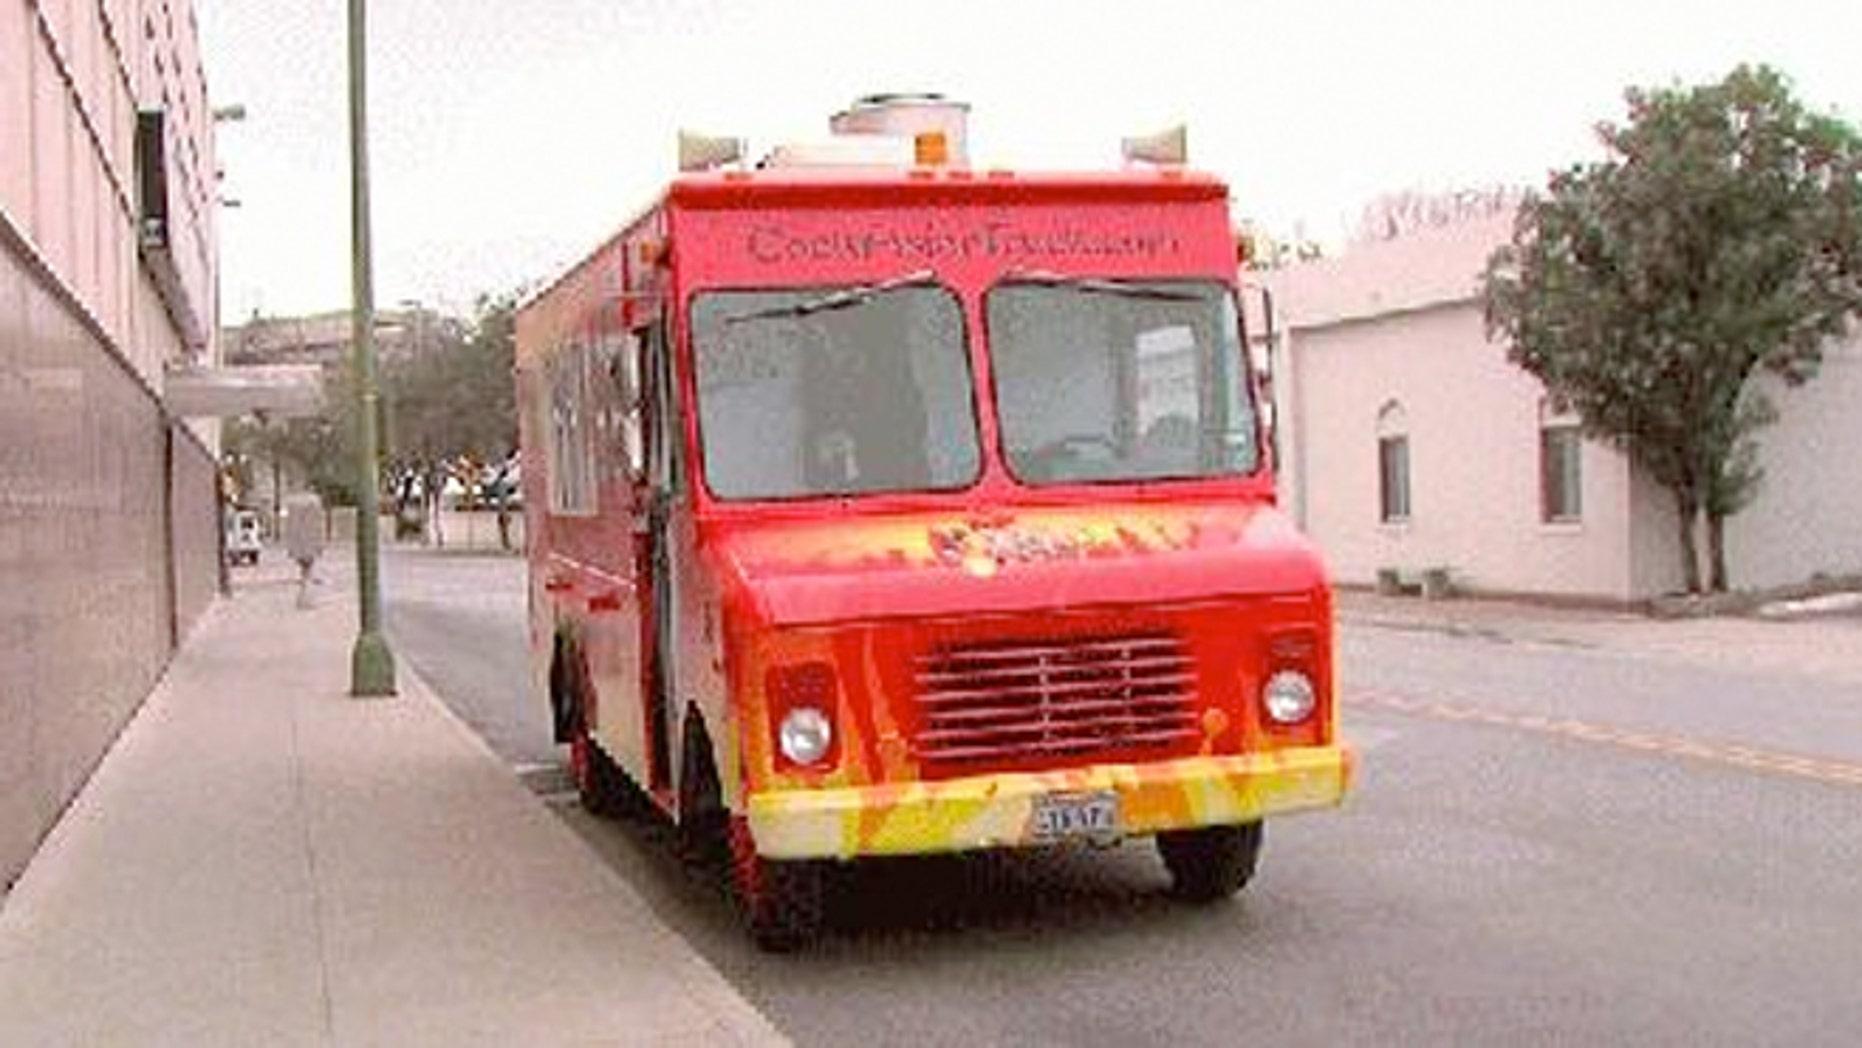 Port San Antonio officials have banned CockAsian, a spicy Korean food truck.